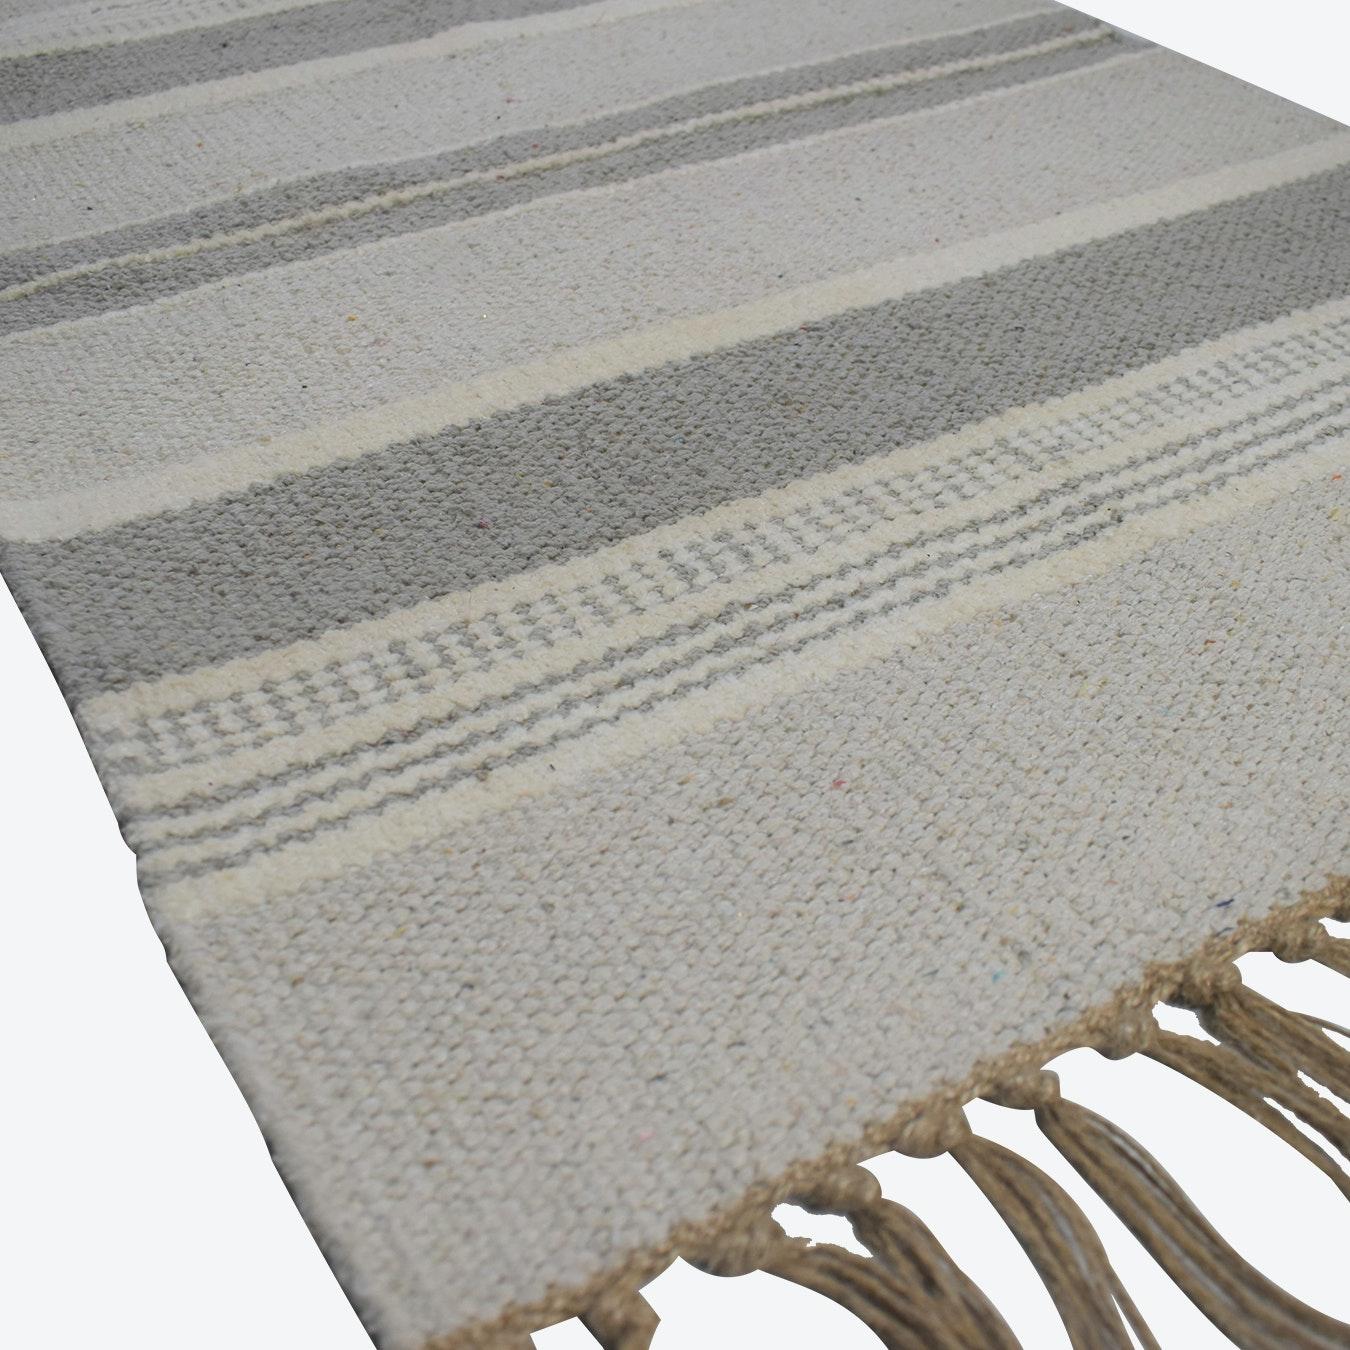 Natural Mushroom Rug Recycled Cotton